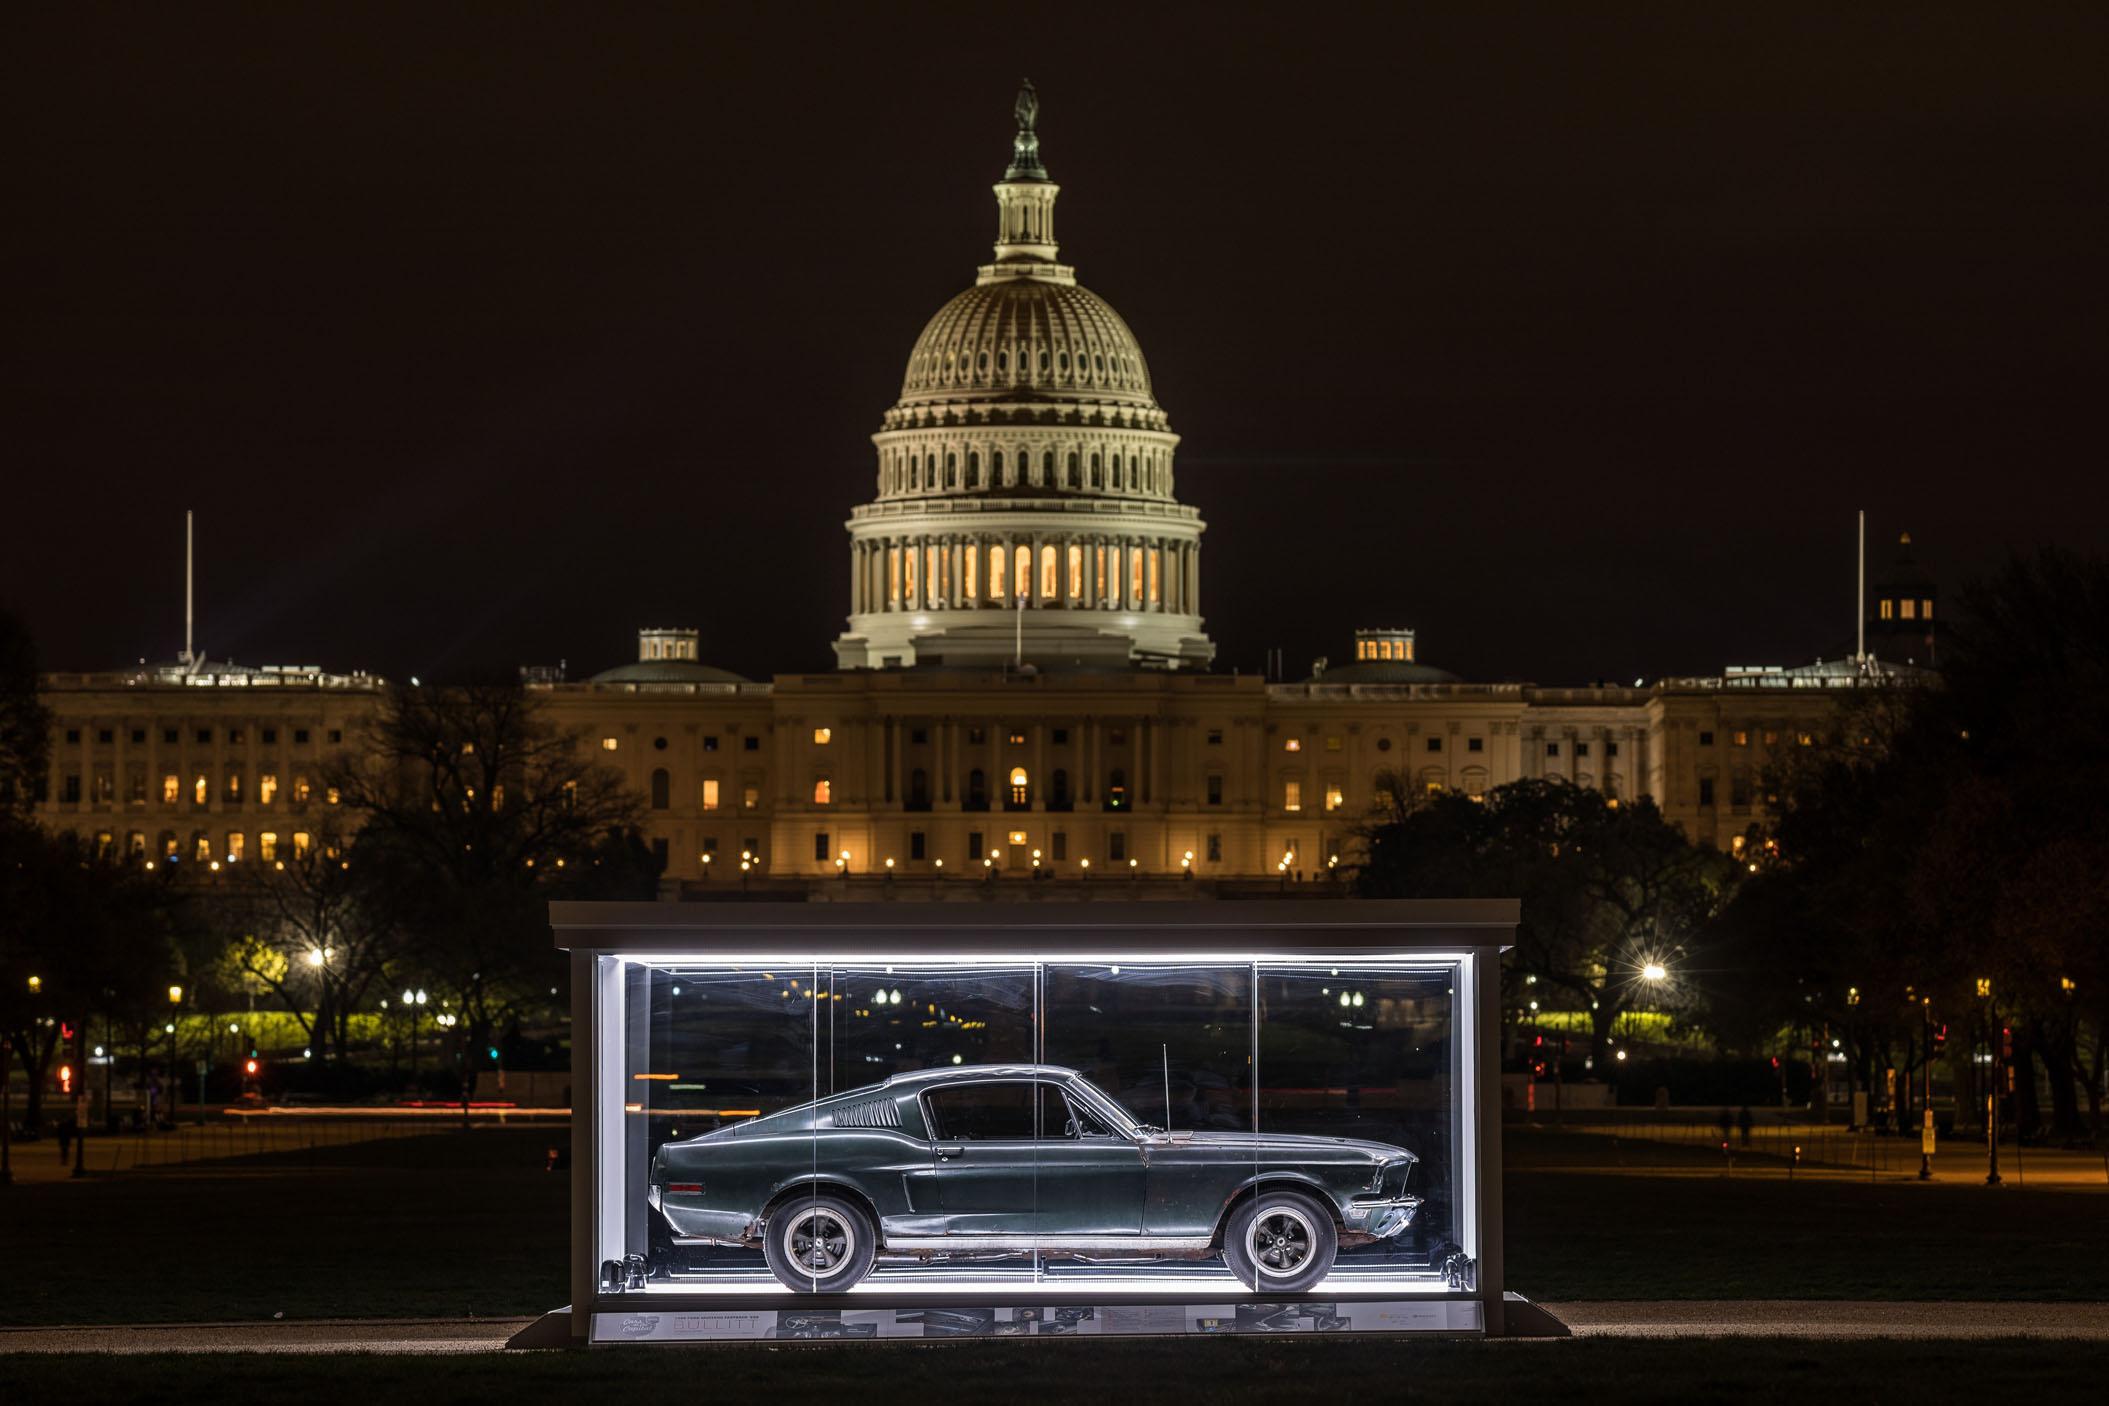 Bullitt on Display at National Mall